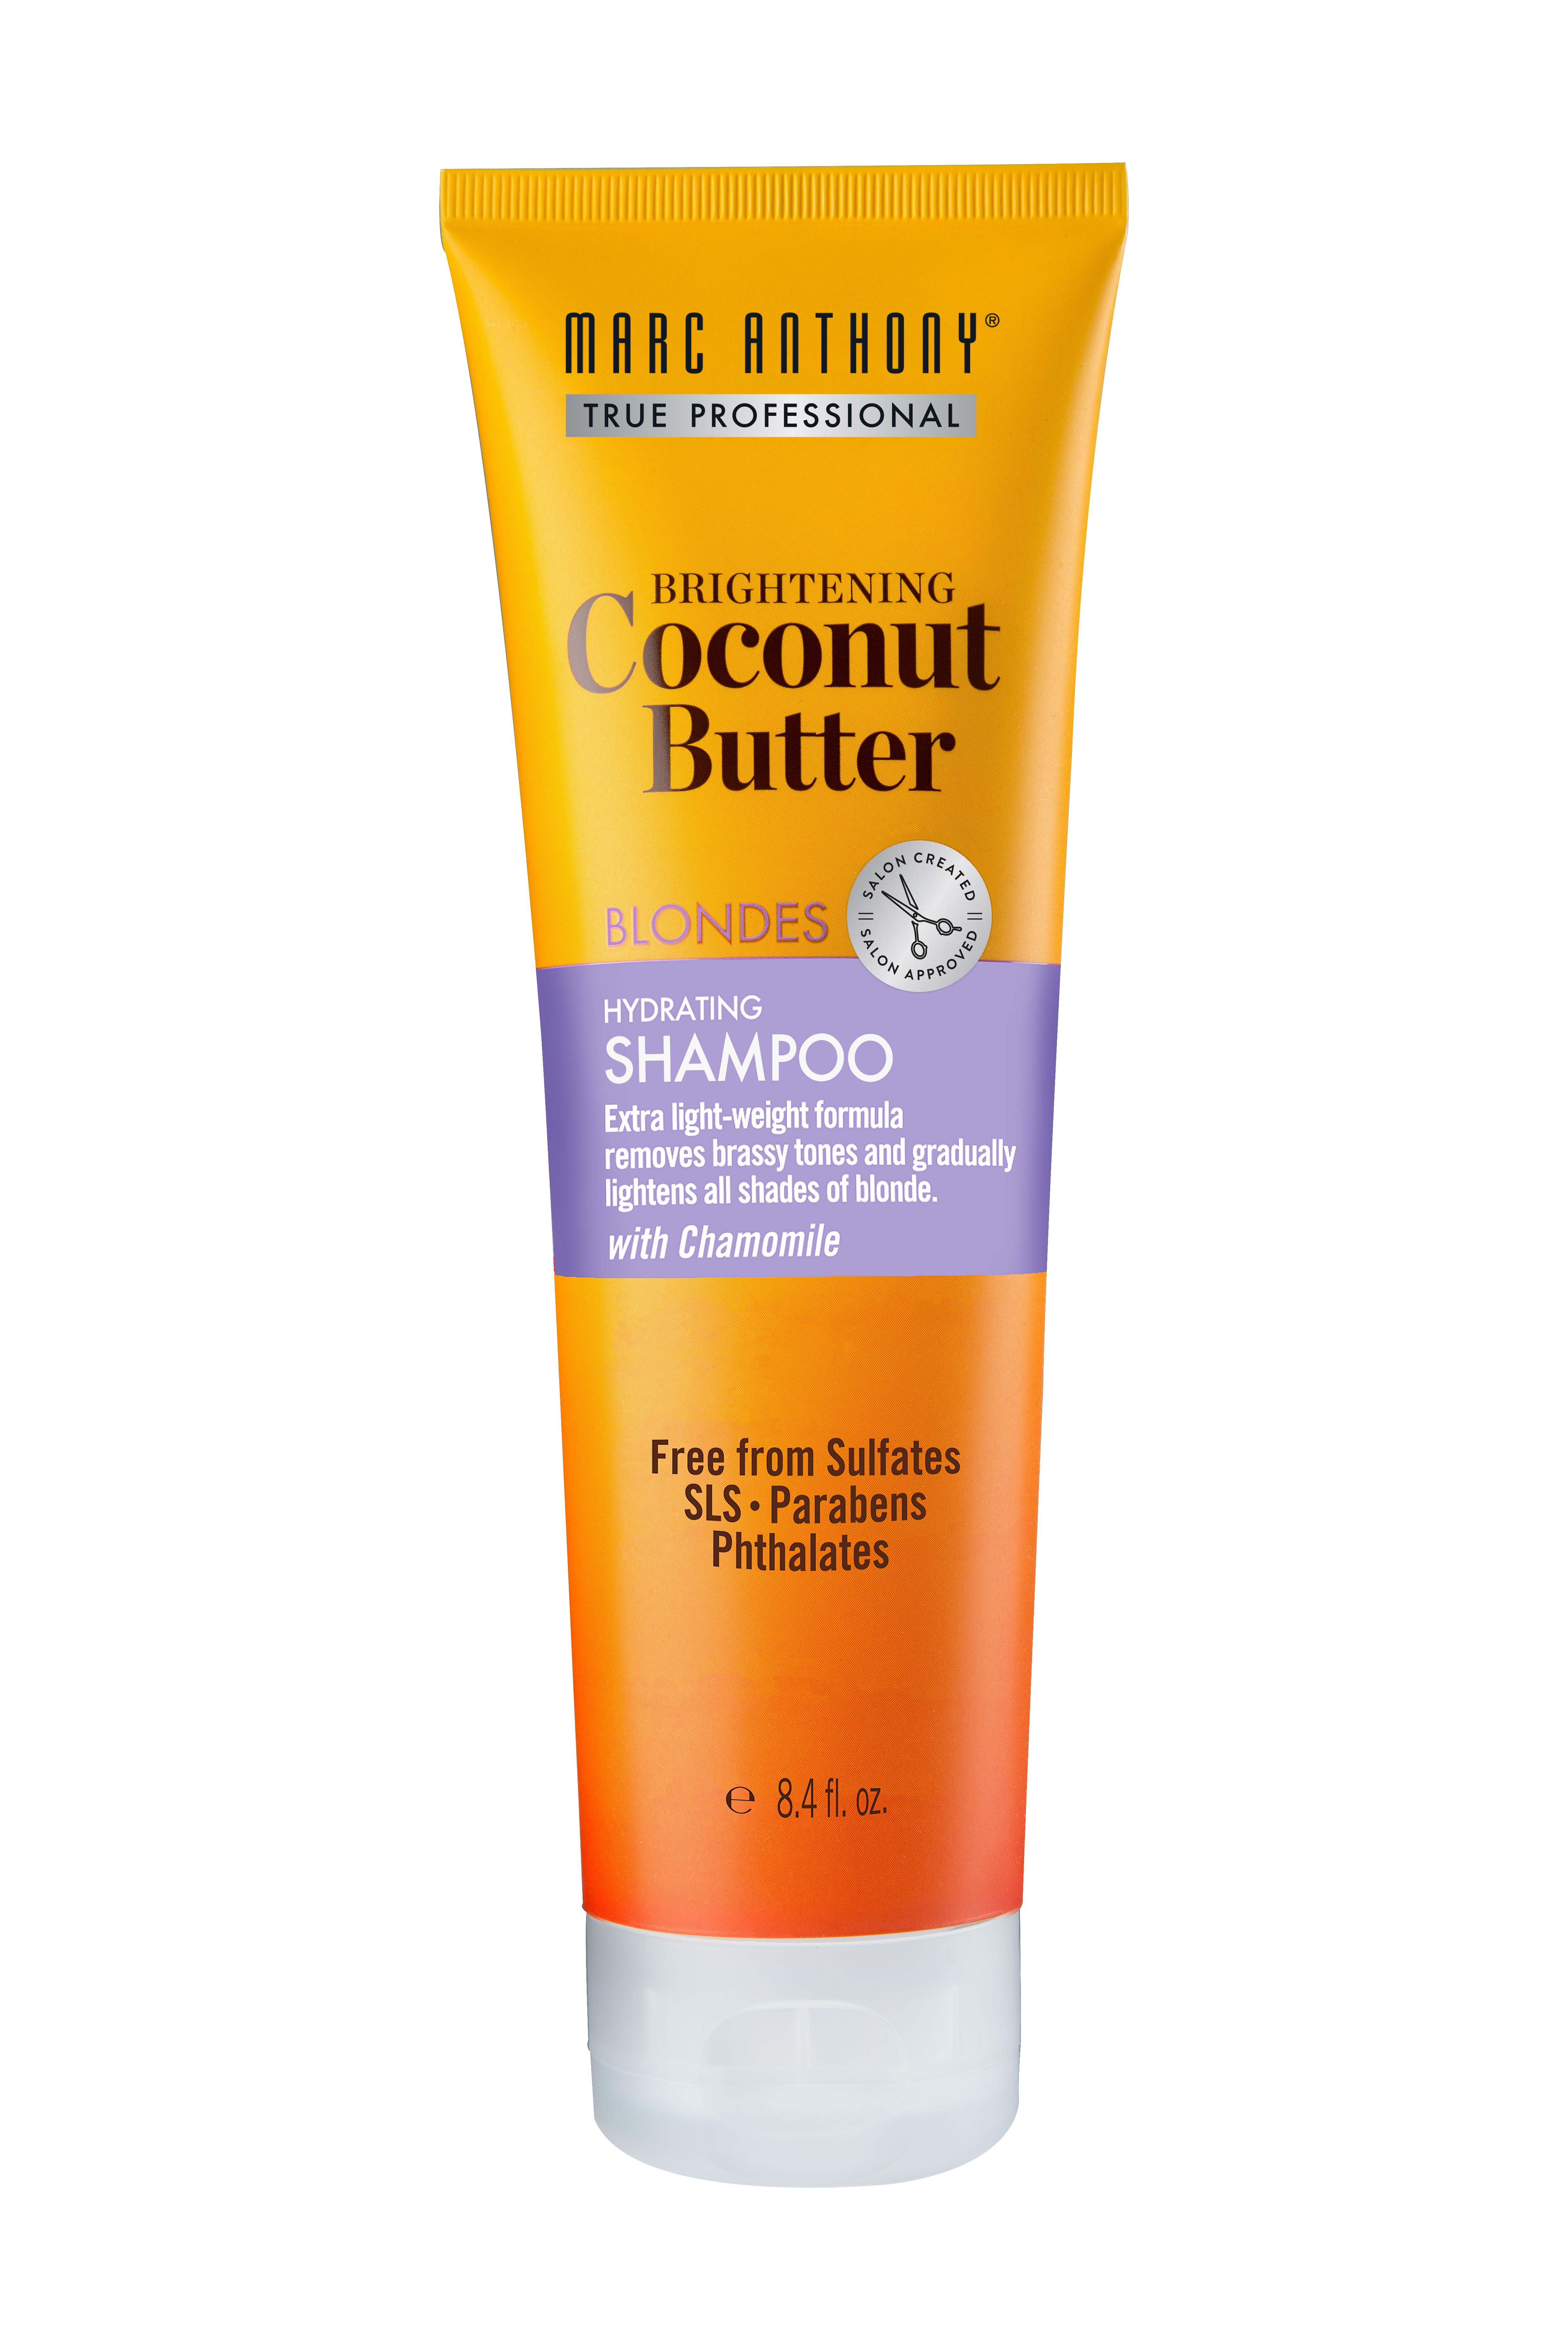 Brightening Coconut Butter Blondes Shampoo